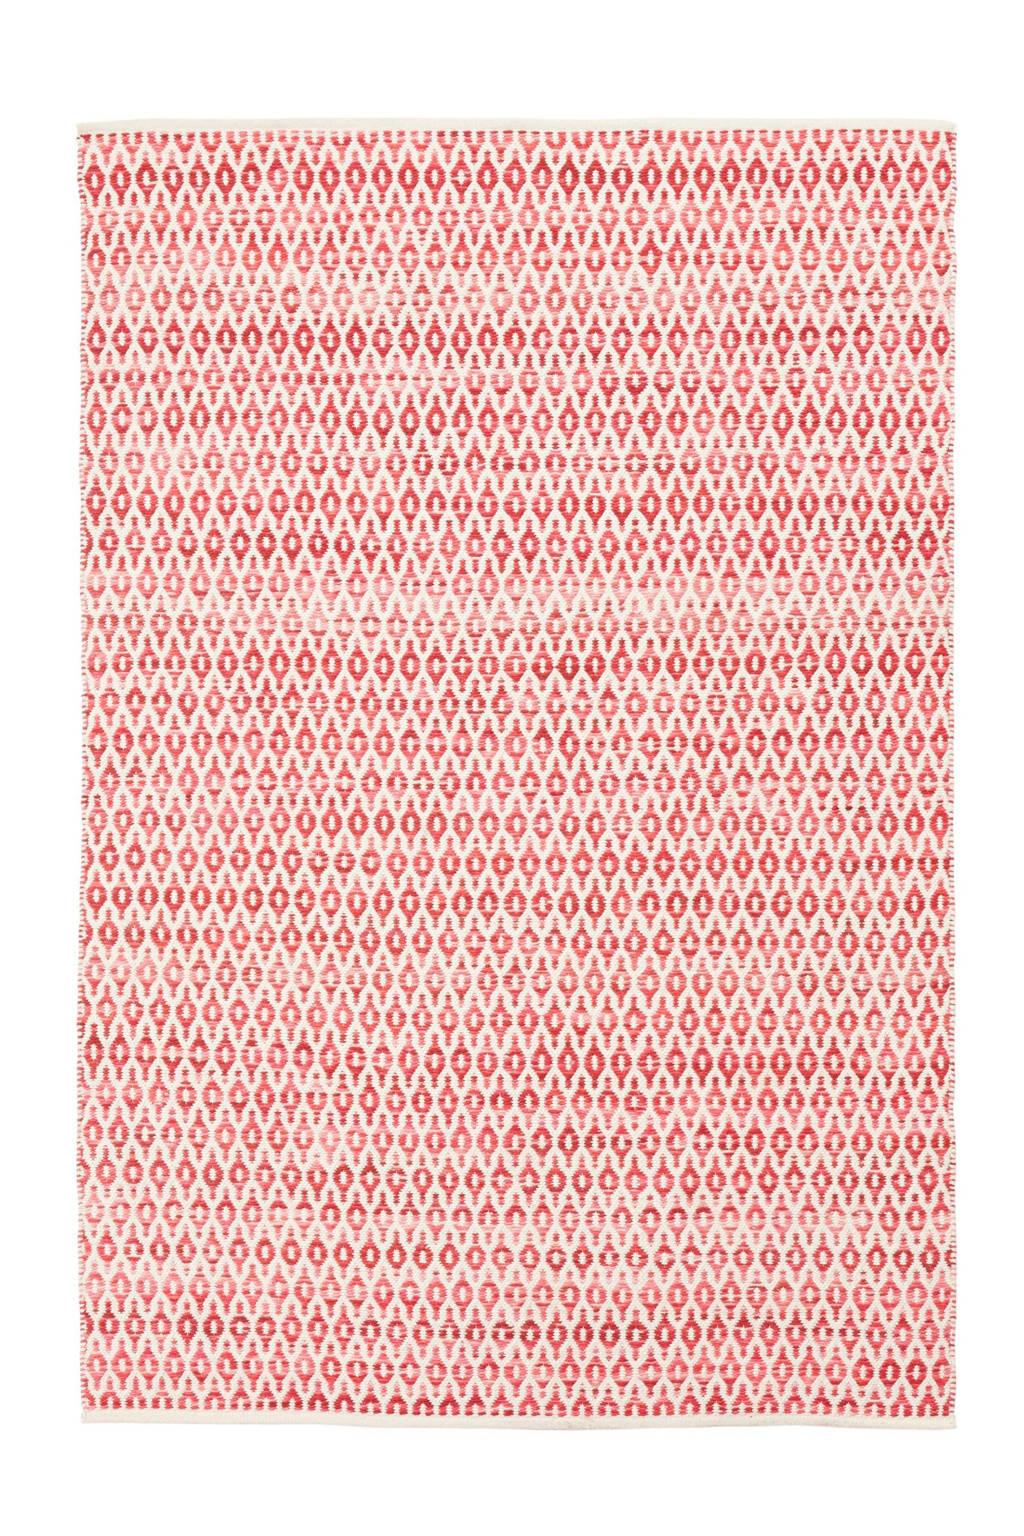 whkmp's own Vloerkleed (wol)  (230x160 cm), Rood/offwhite